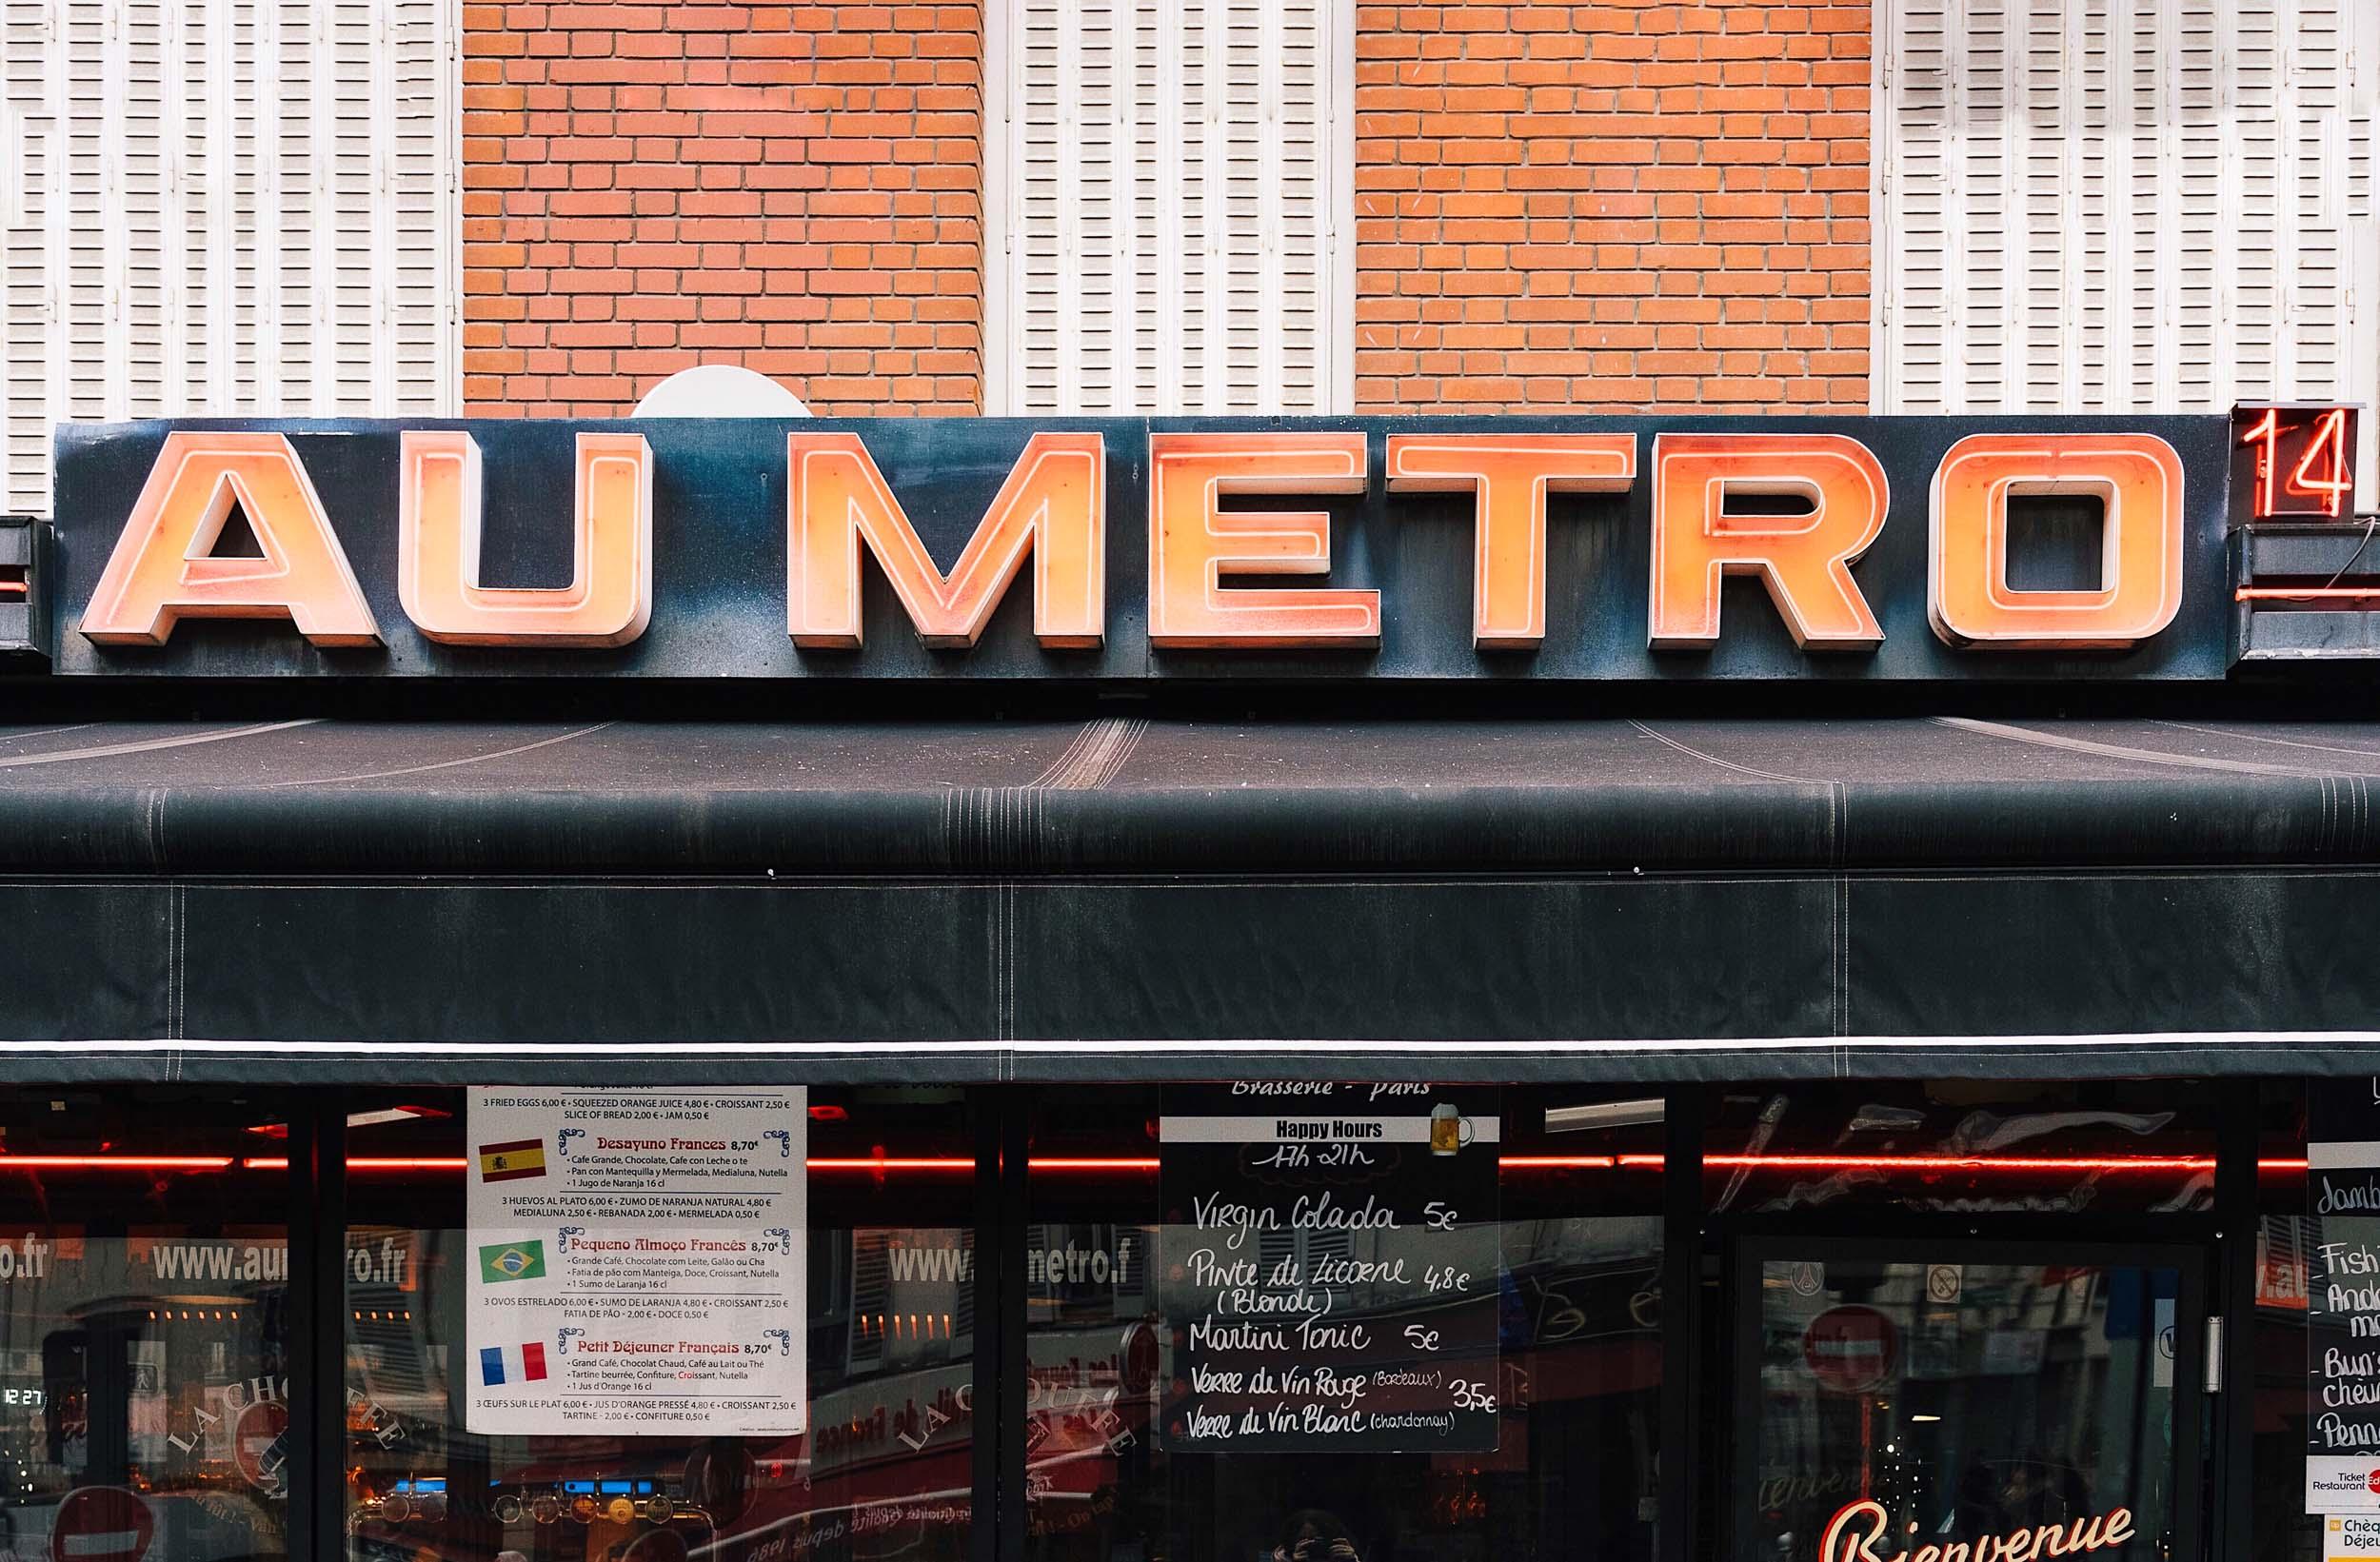 The Metro in Paris is the best way to get around!